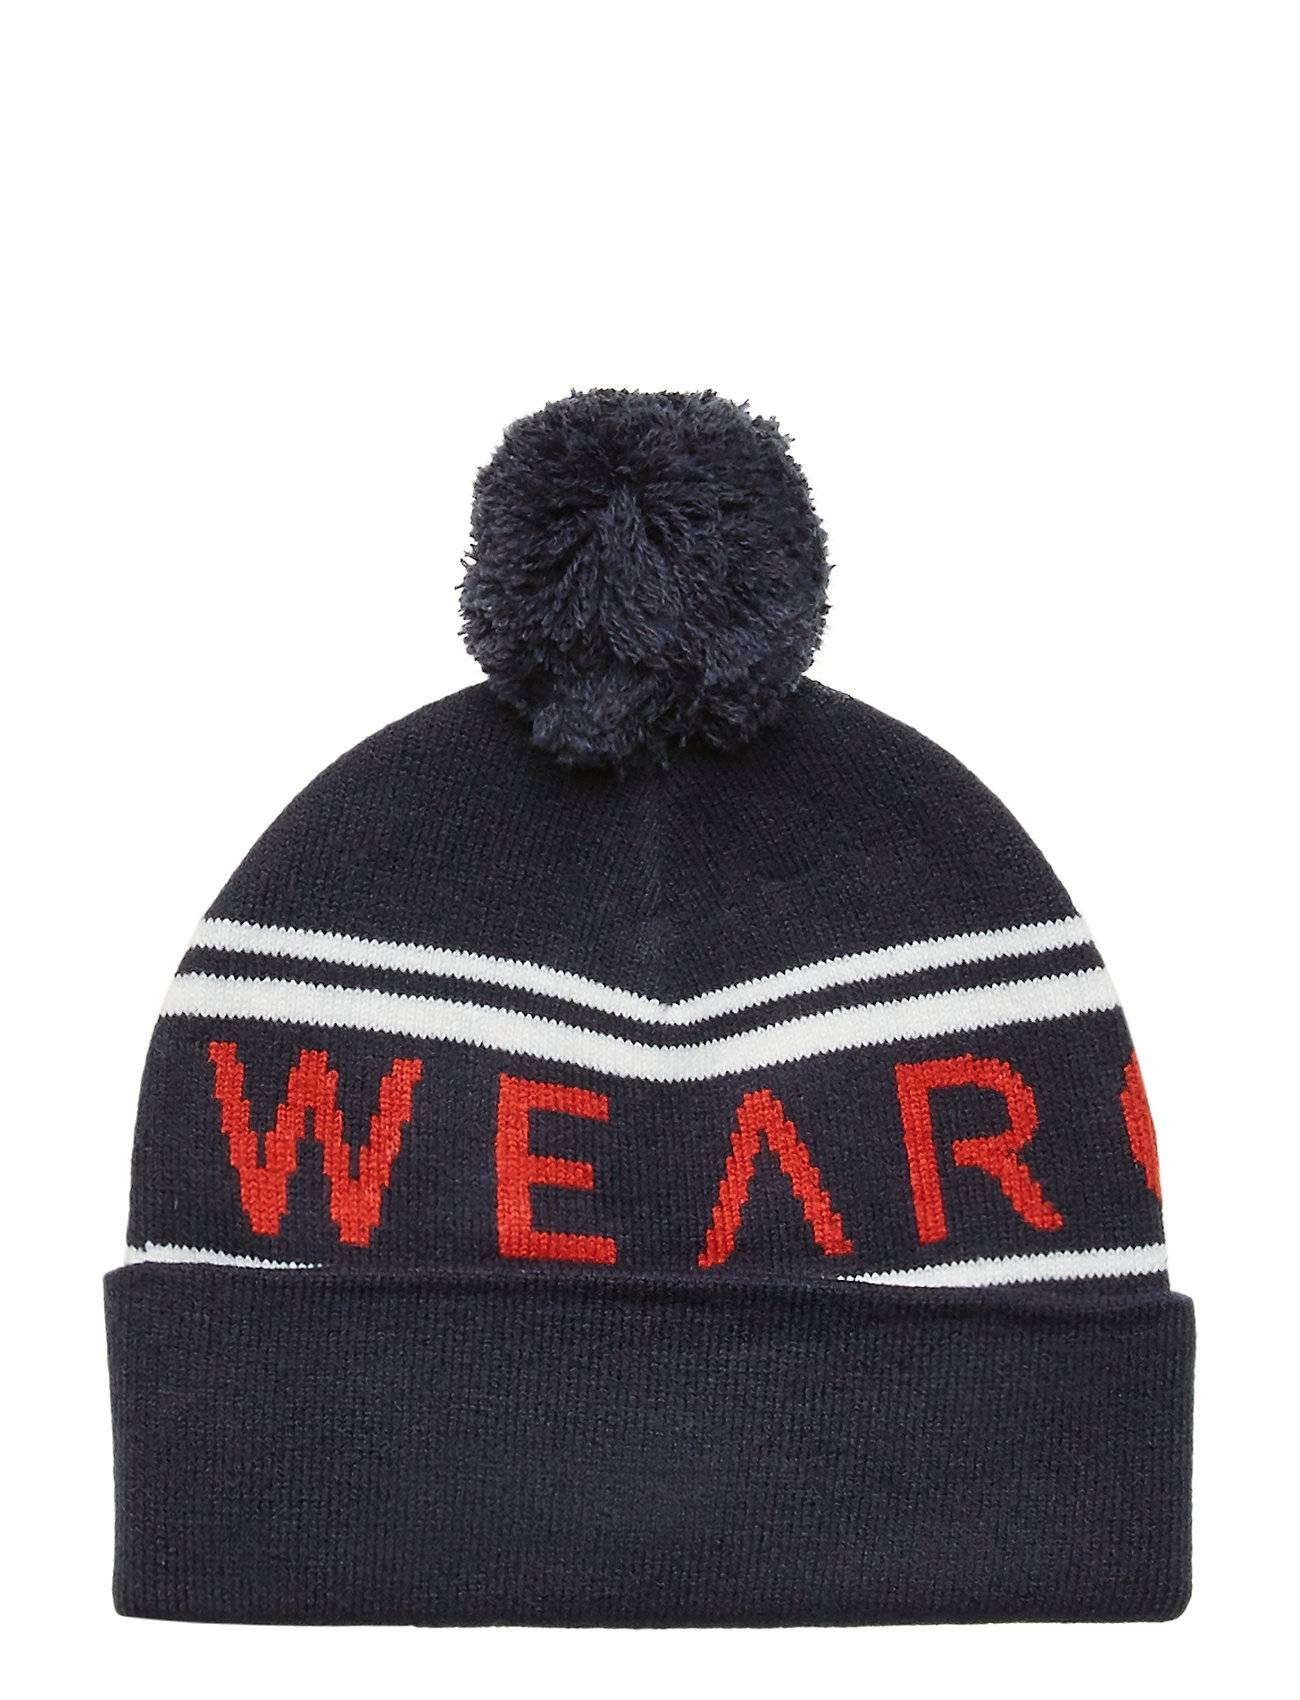 WearColour Knit Beanie Accessories Headwear Beanies Sininen WearColour